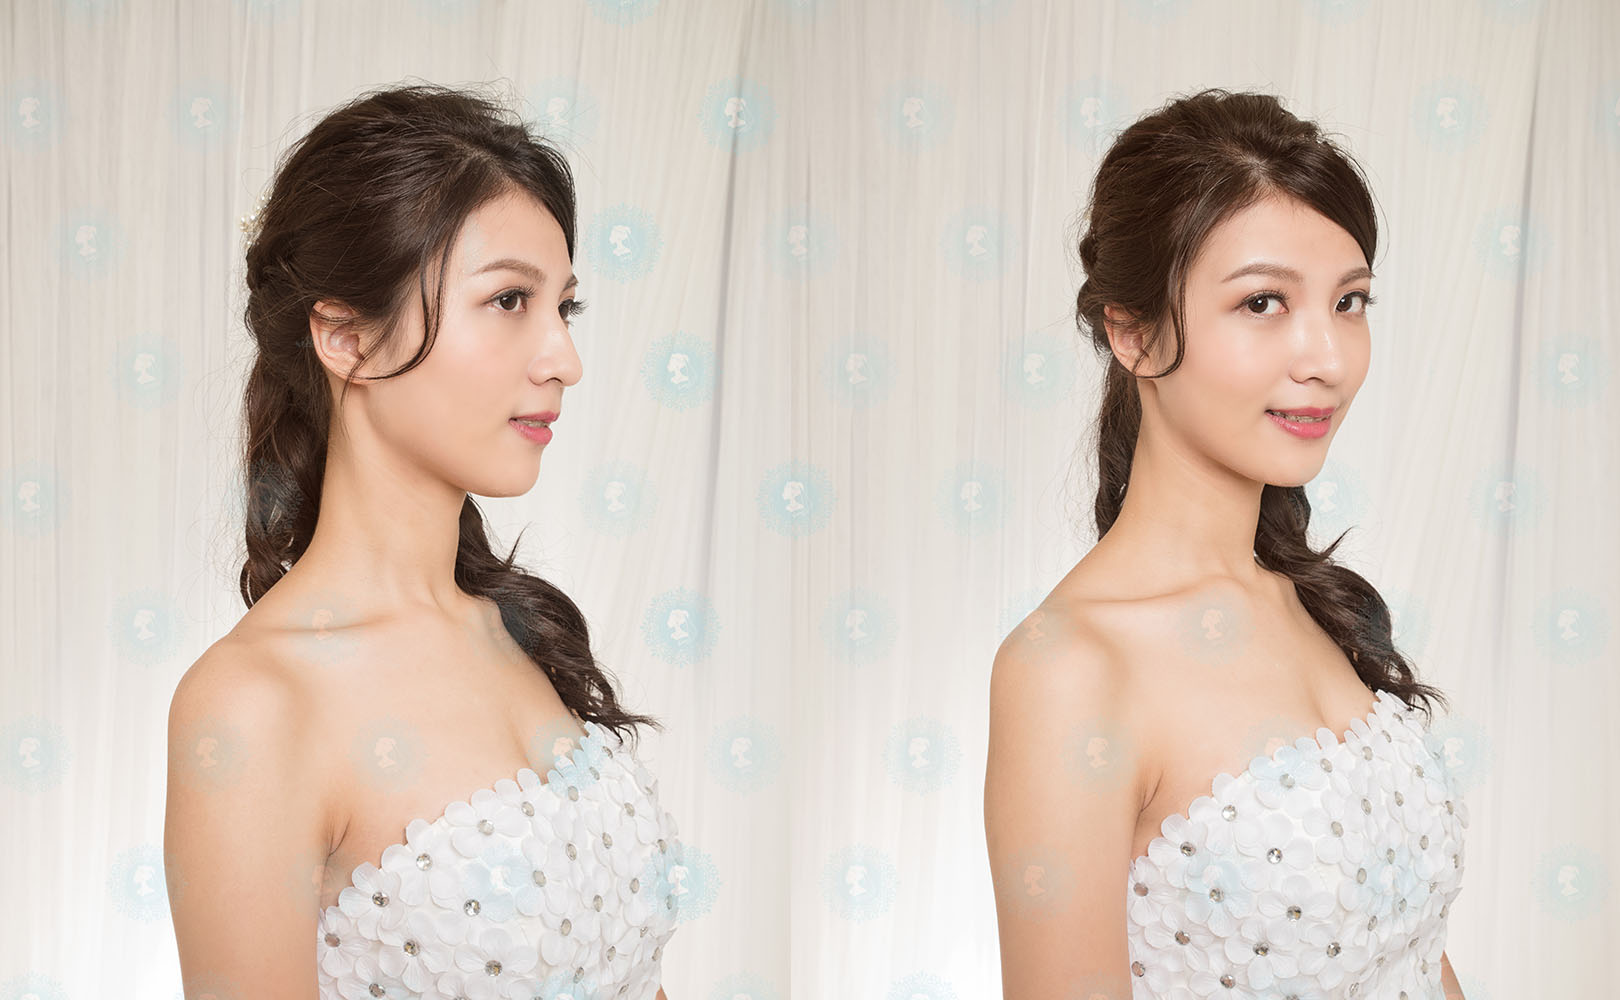 iling形象彩妝造型-新娘秘書作品-細緻經典白紗-美妝牆1